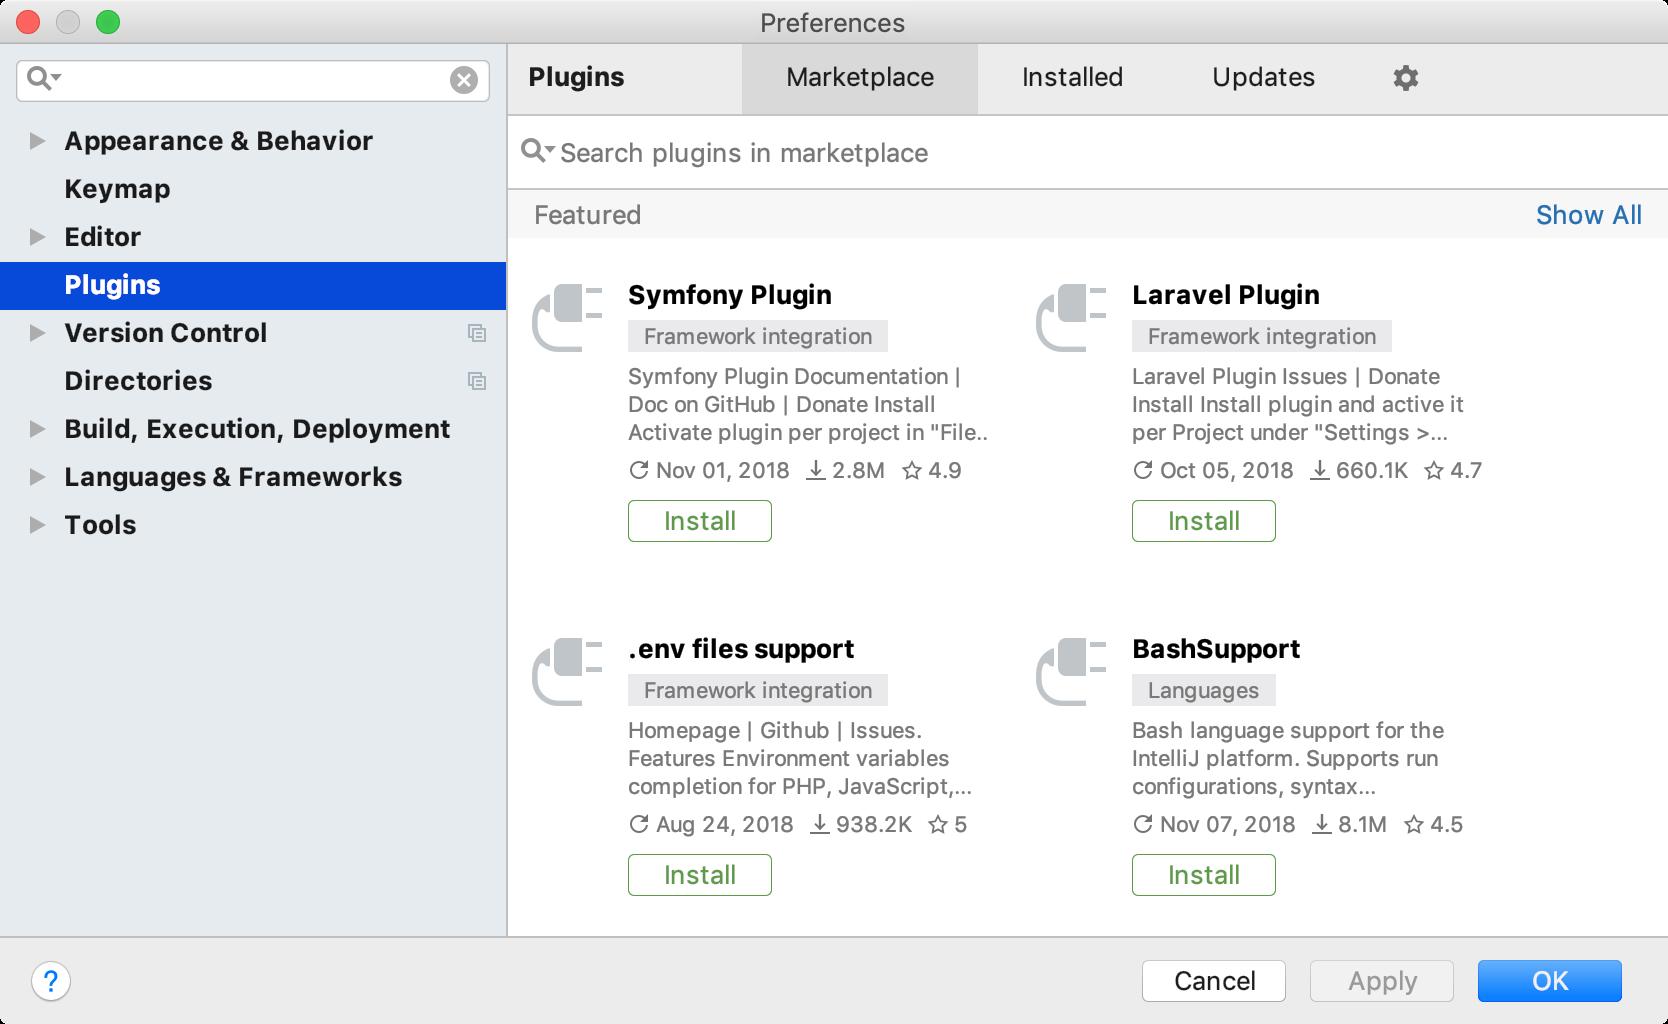 The Plugins settings dialog